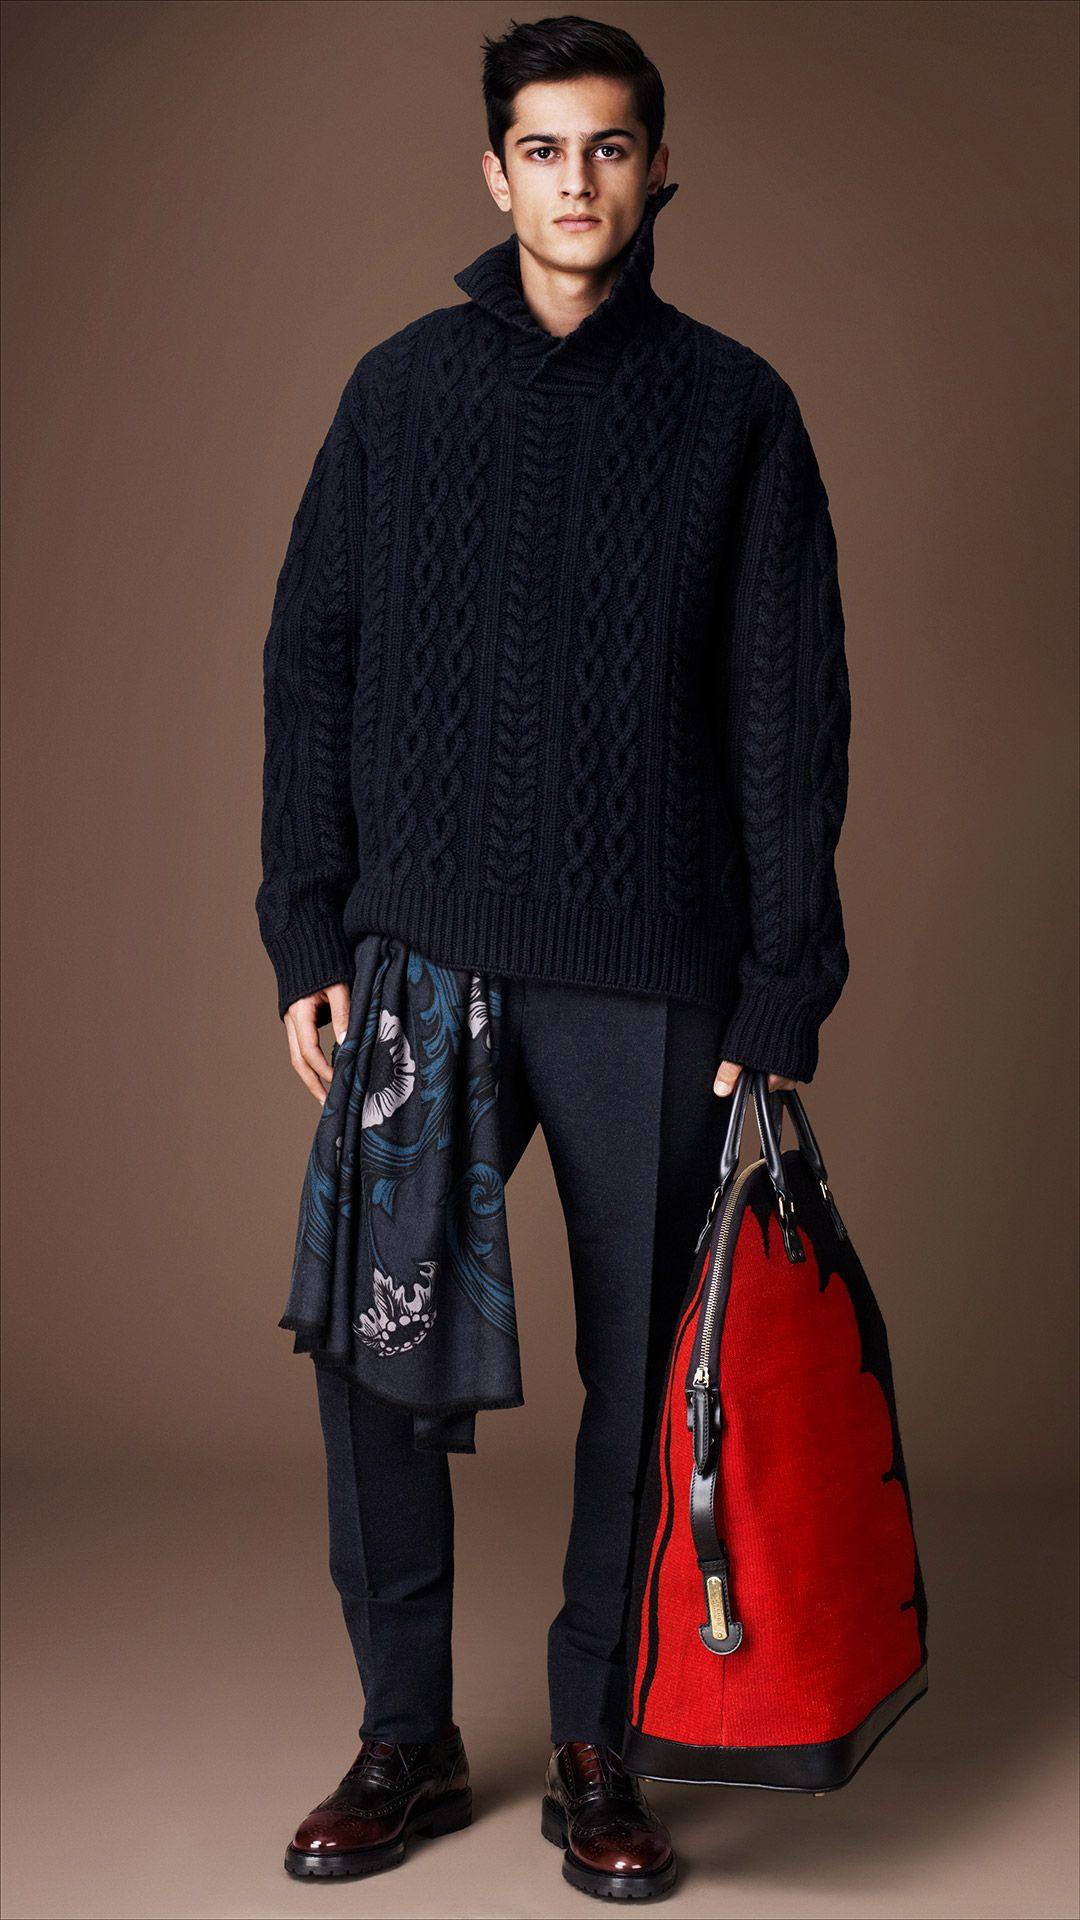 Burberry Prorsum Menswear Autumn/Winter 2014 show | Burberry #youcancallmehitch #barneybarrett #minimalism #fashion #style #streetwear #knitwear #streetstyle #malemodel #barney_barrett